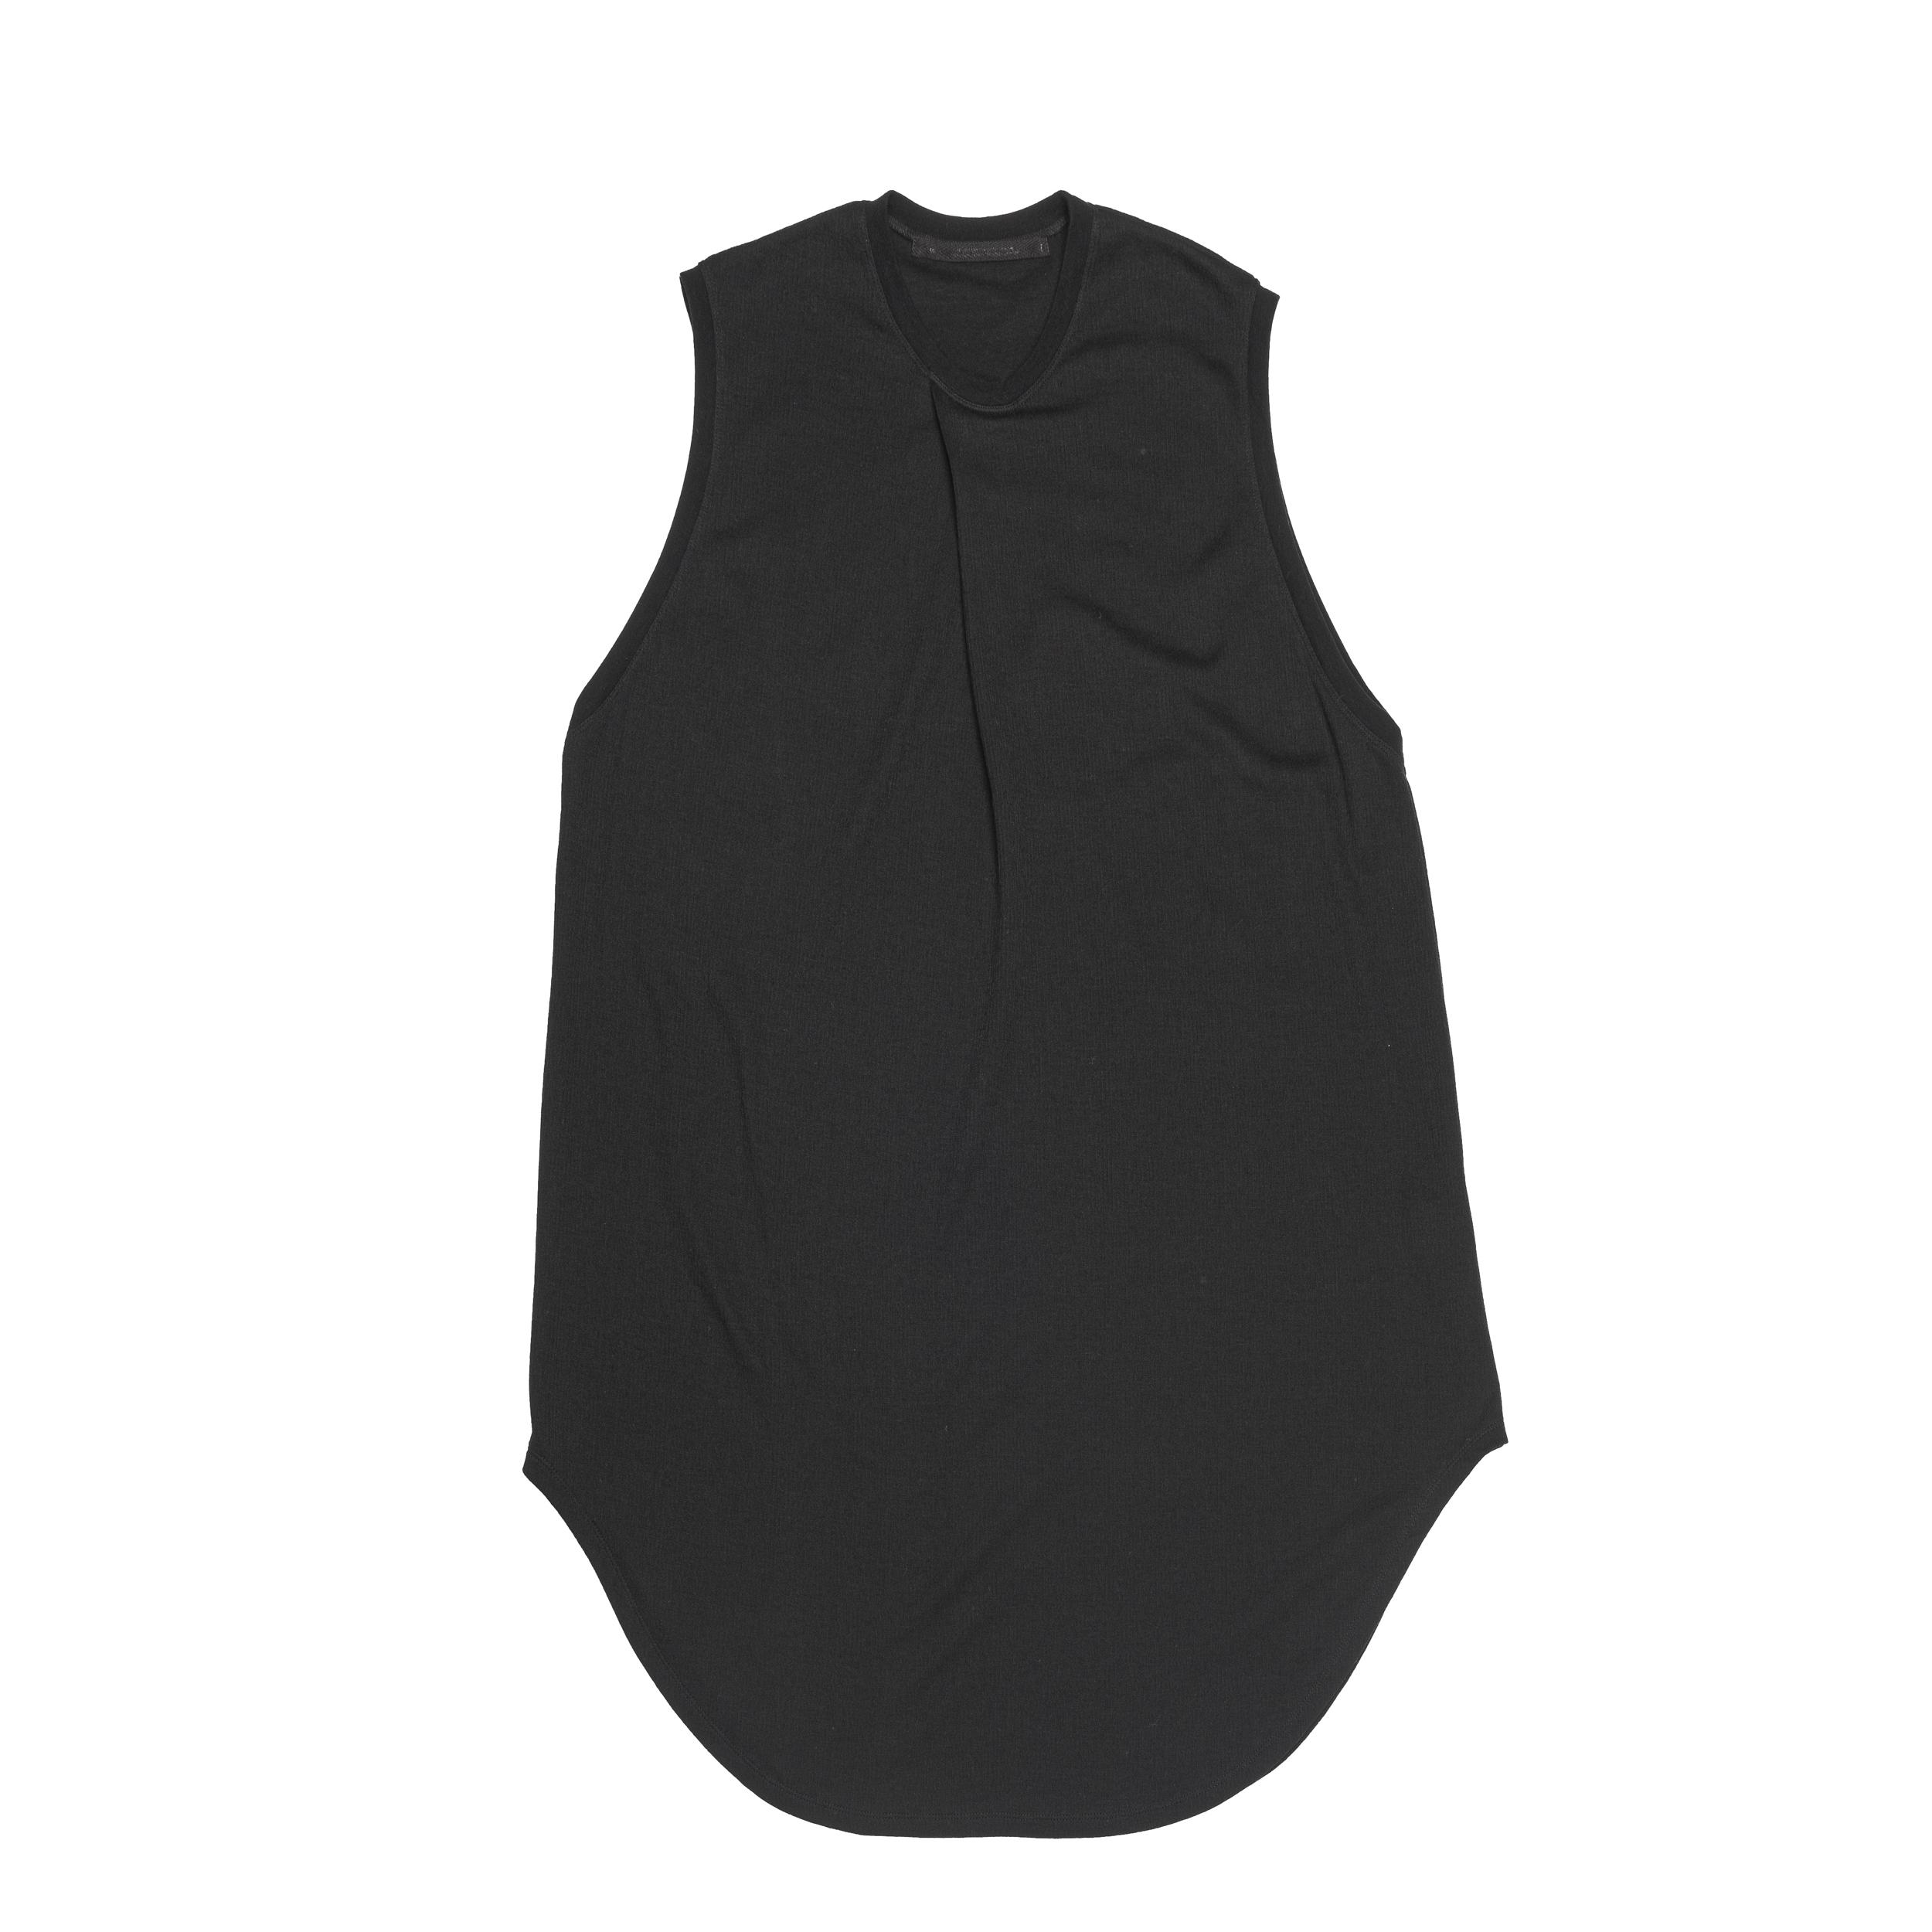 667CUM4-BLACK / タックドノースリーブシャツ